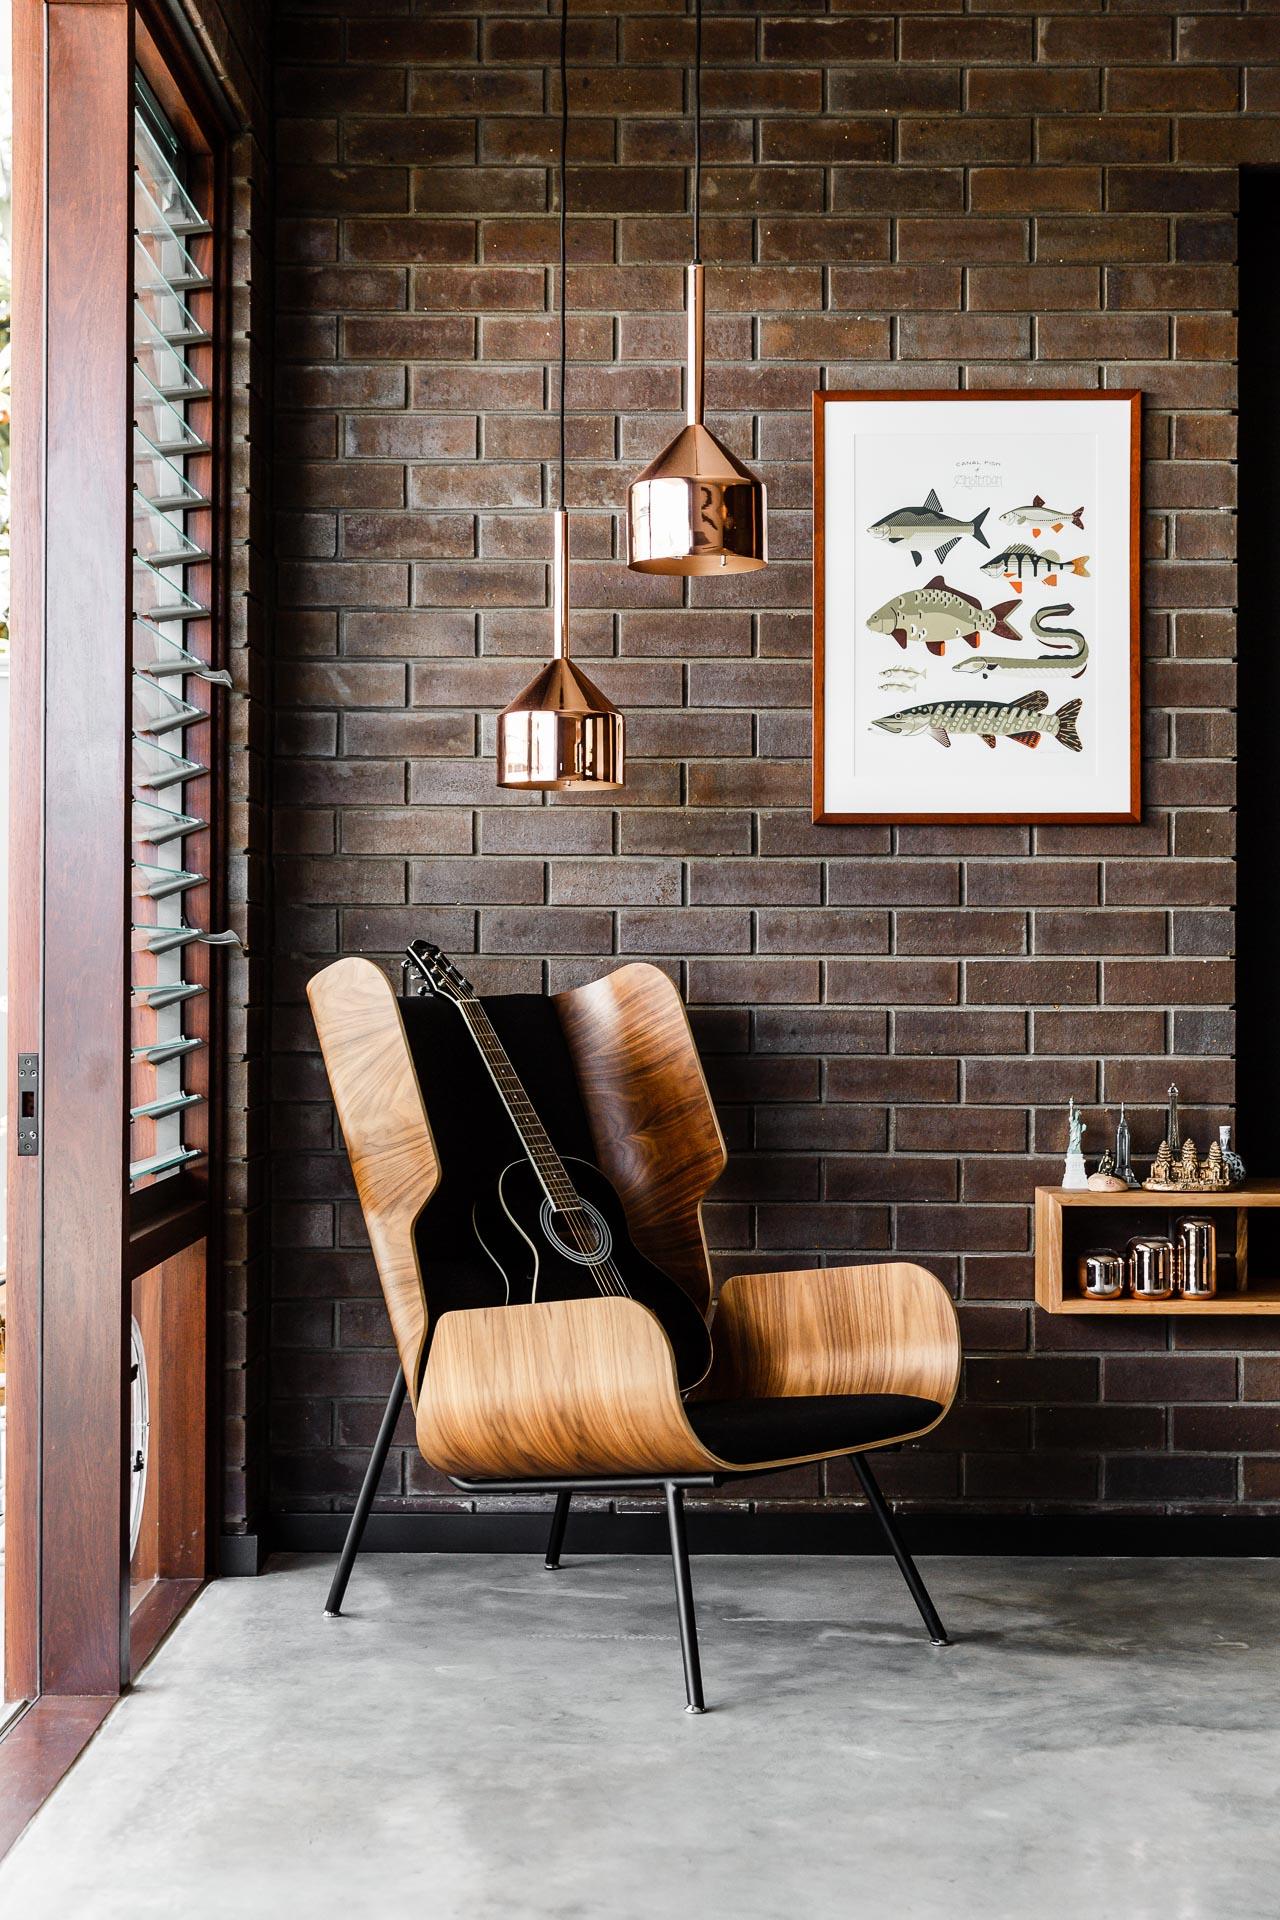 WEB - Architectural Photography Sydney - Open House Perth 2016  - Sebastian Photography 9.jpg